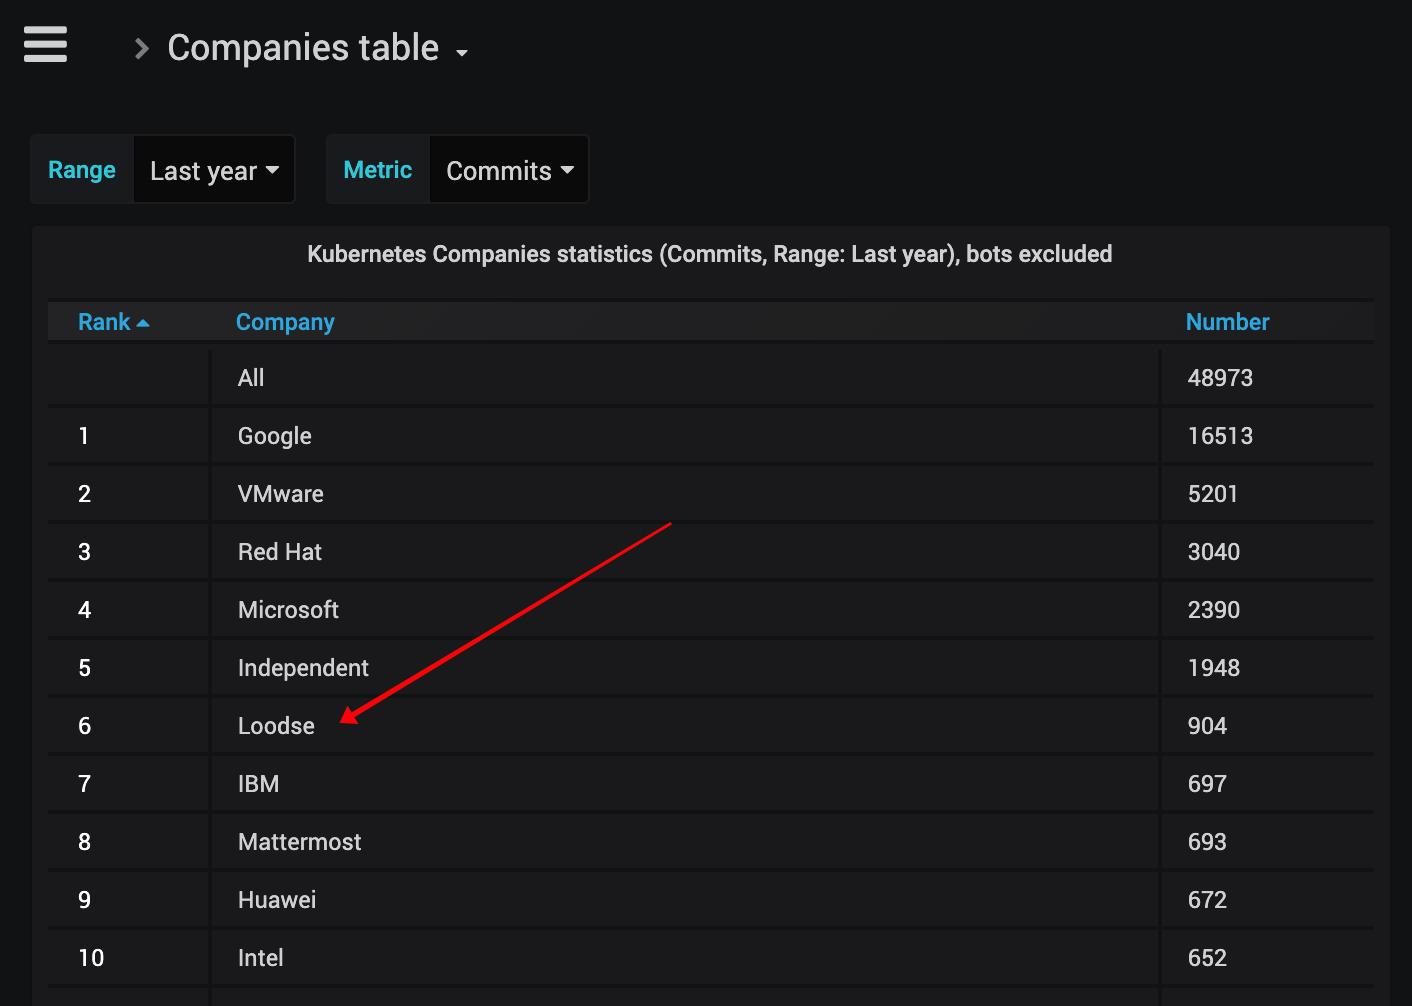 2019 Kubernetes companies statistics by commits